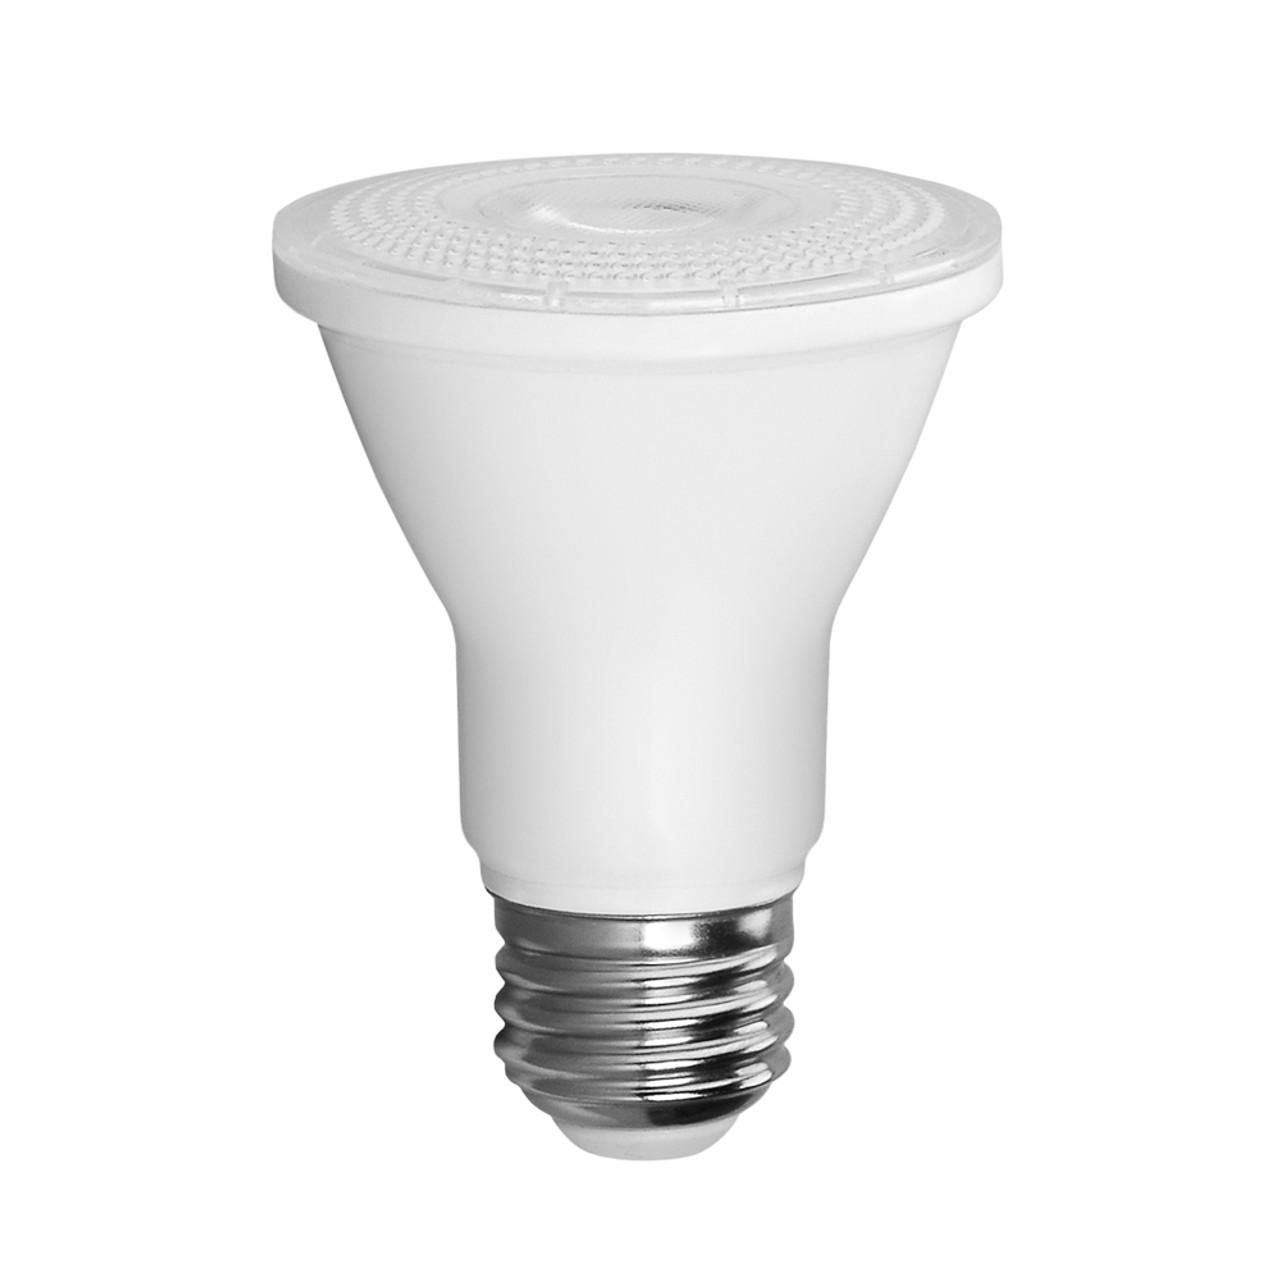 PAR20, Directional (Wide Spot), LED Light Bulbs, Dimmable, 5.5 W, 120 V, 500 lm, 5000 K, E26 Base (EP20-5050cecw-2)